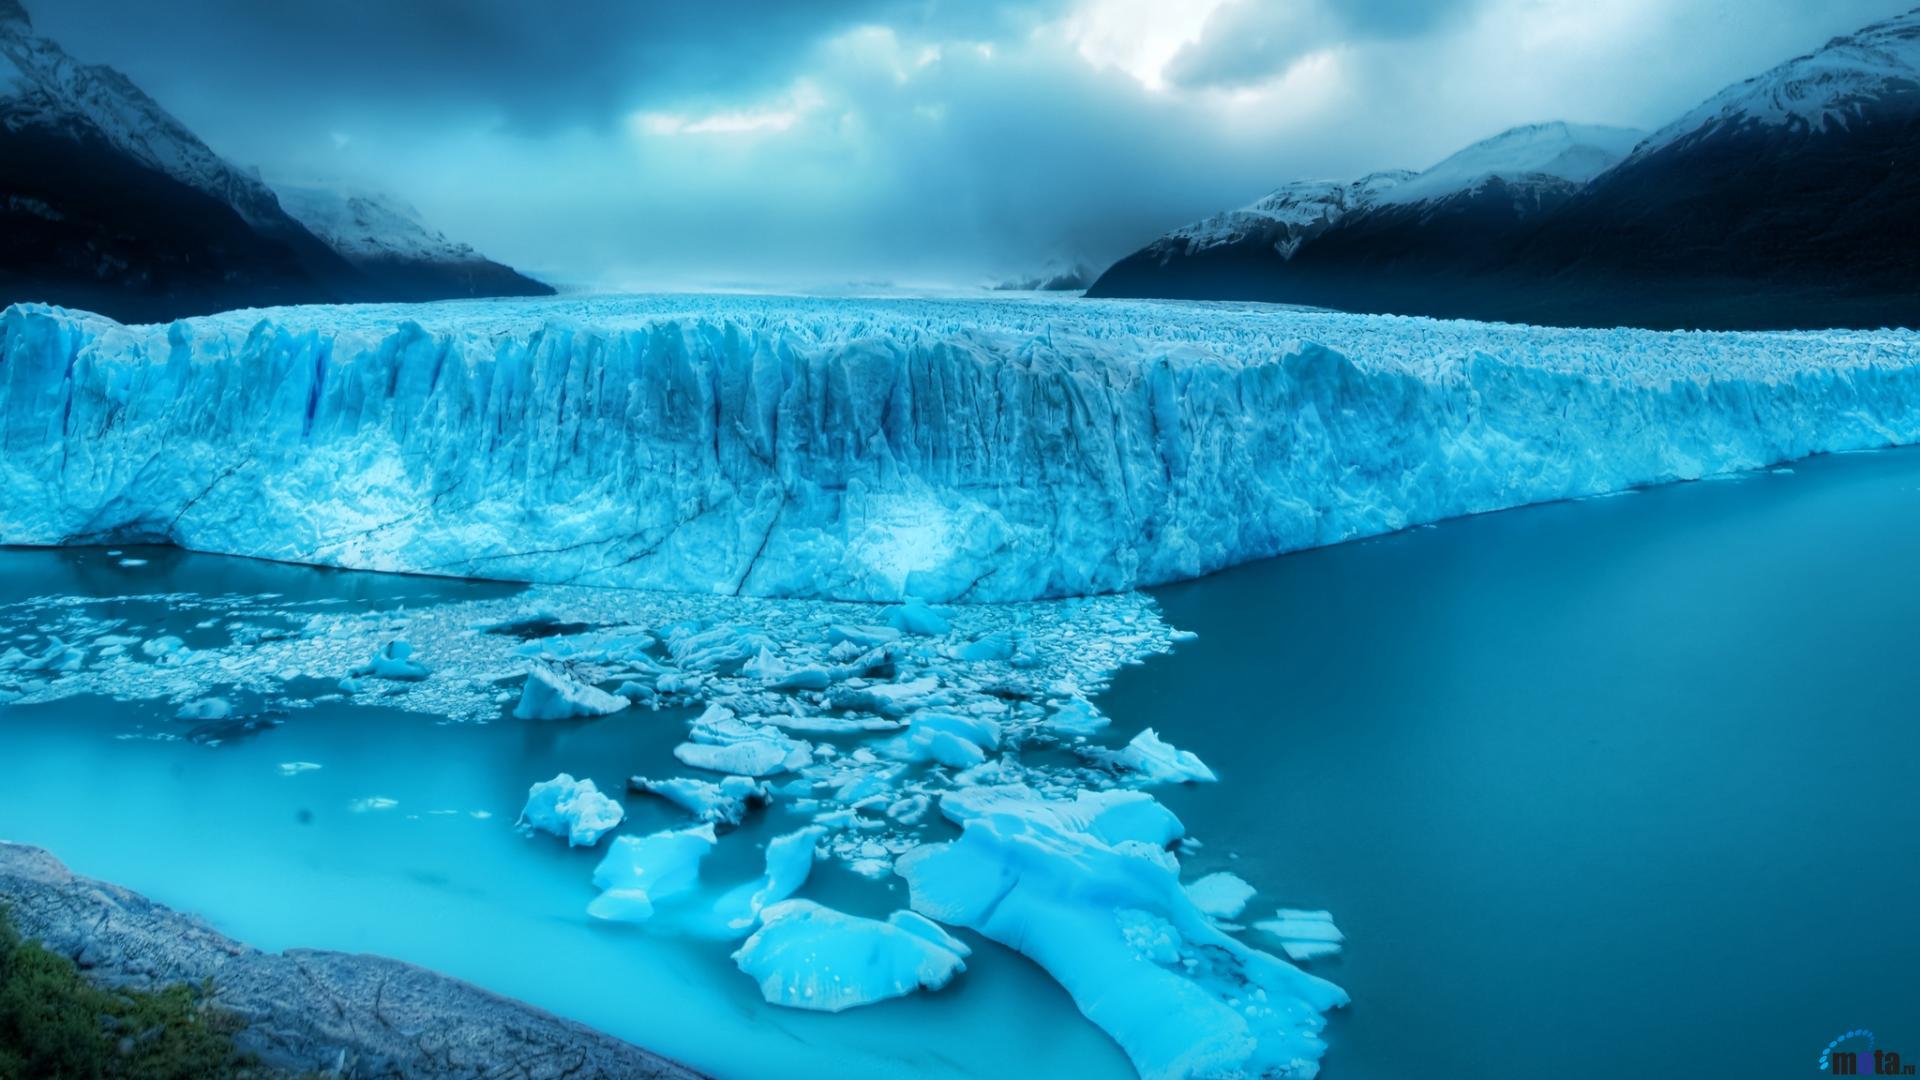 Glacier 17201 1024x768 px